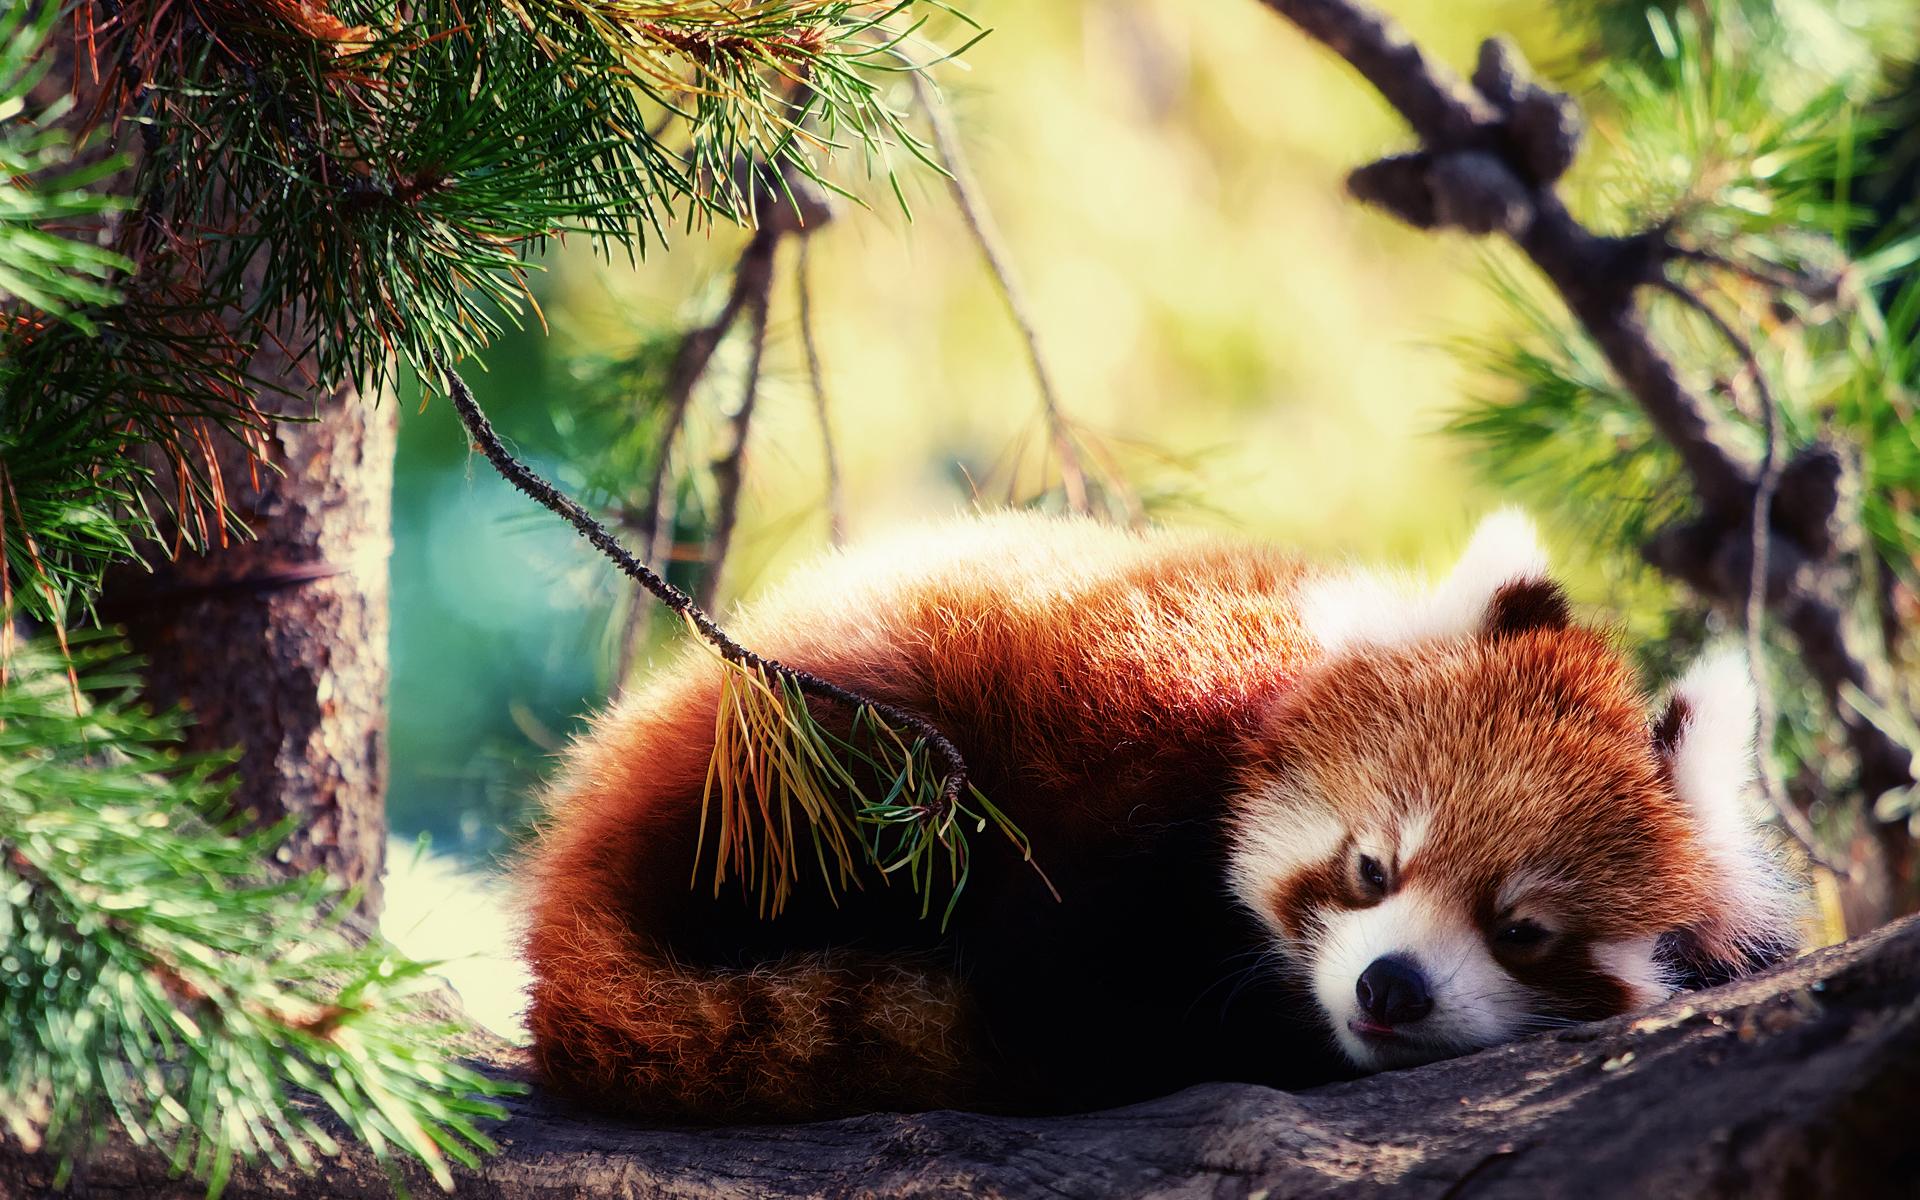 Sad Panda HD Desktop Wallpaper HD Desktop Wallpaper 1920x1200